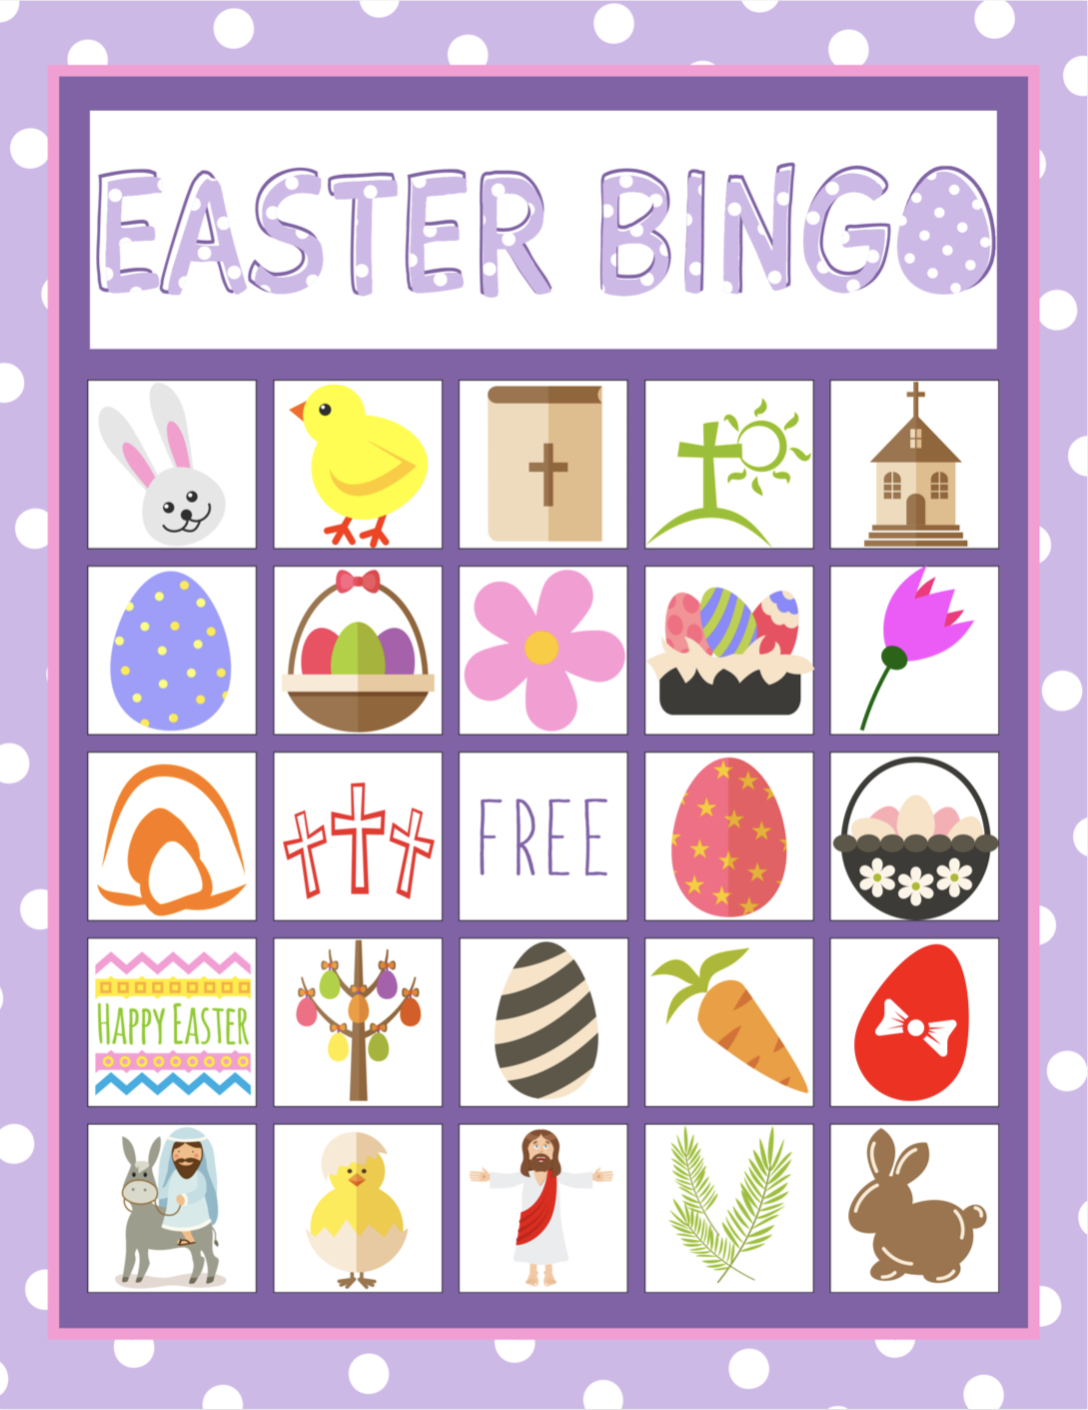 Easter Bingo Game For Kids   Children's Pastor Only   Easter Bingo - Free Printable Religious Easter Bingo Cards